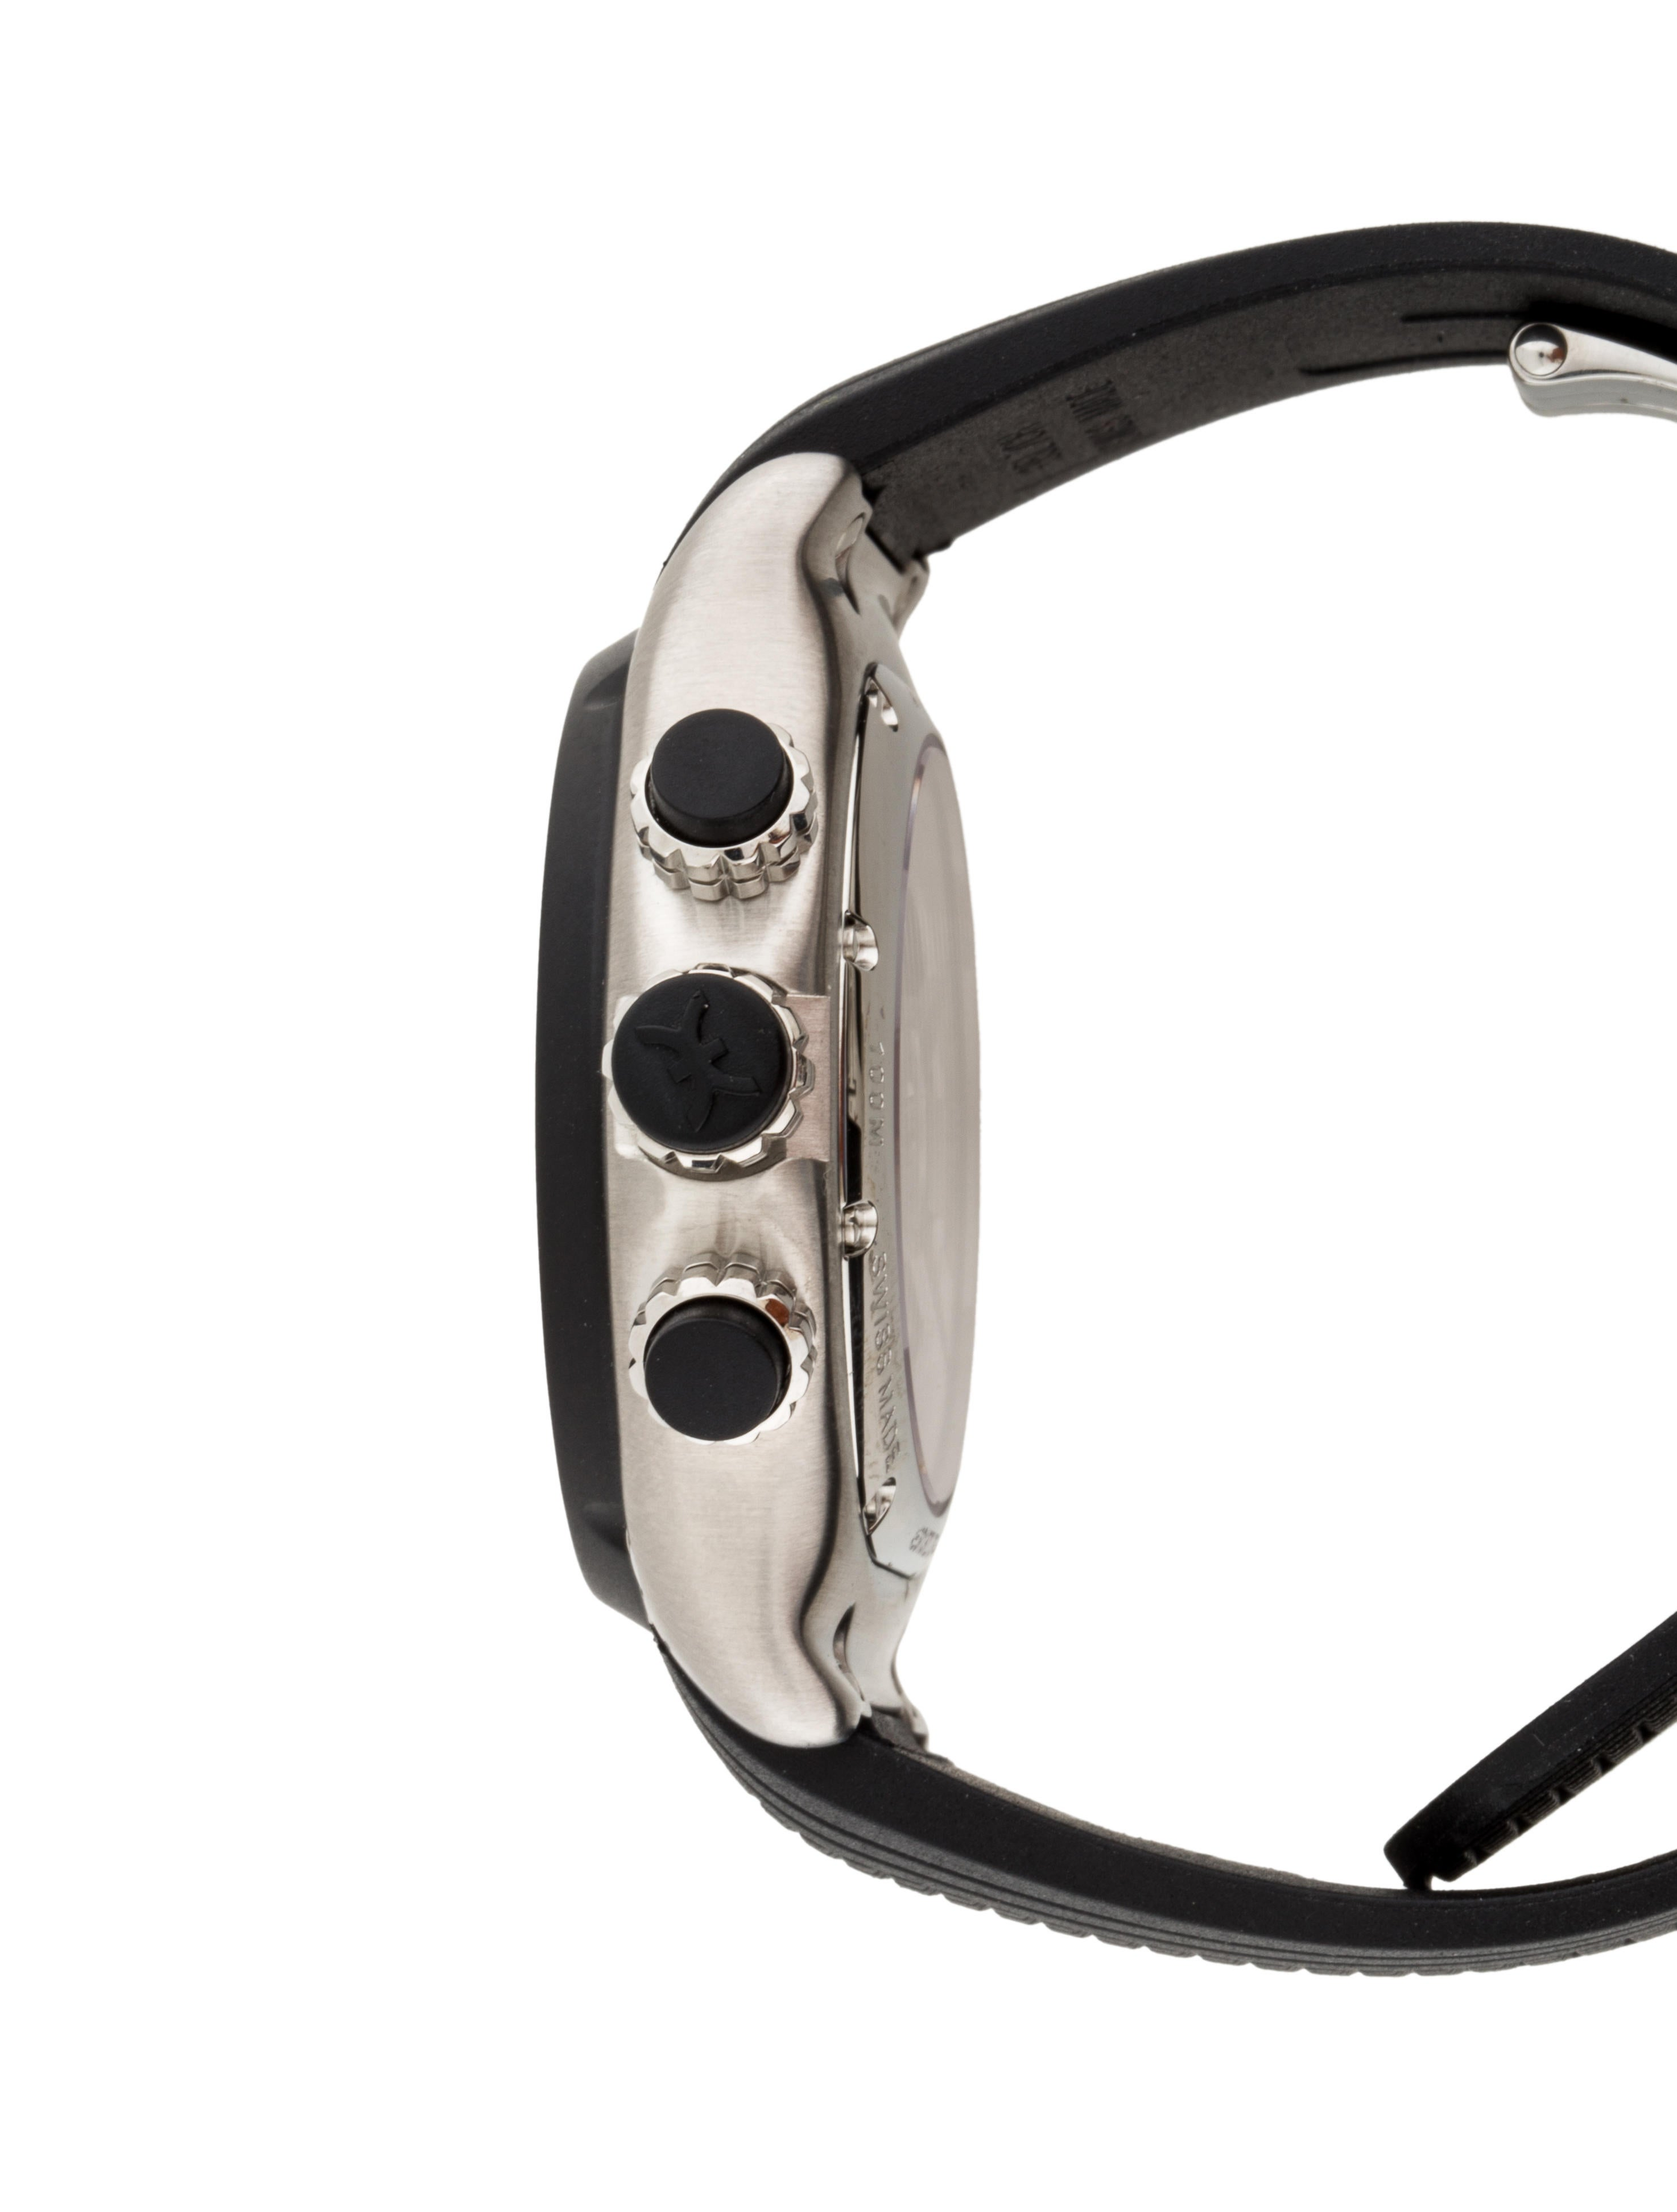 Ebel 1911 BTR Chronograph Watch w/ Tags - Strap - EBE20218